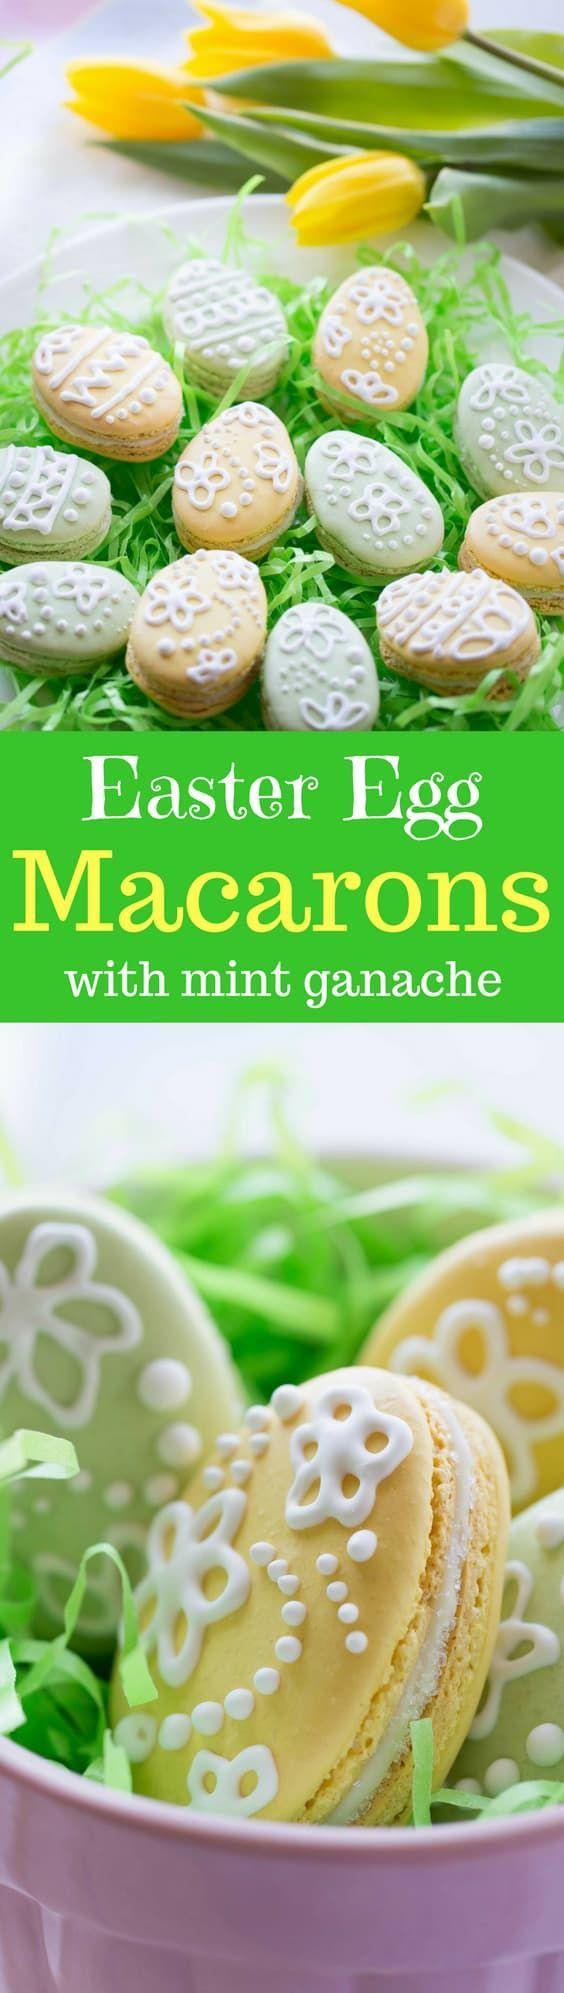 Easter Egg Macarons with White Chocolate-Mint Ganache ~ from www.savingdessert.com